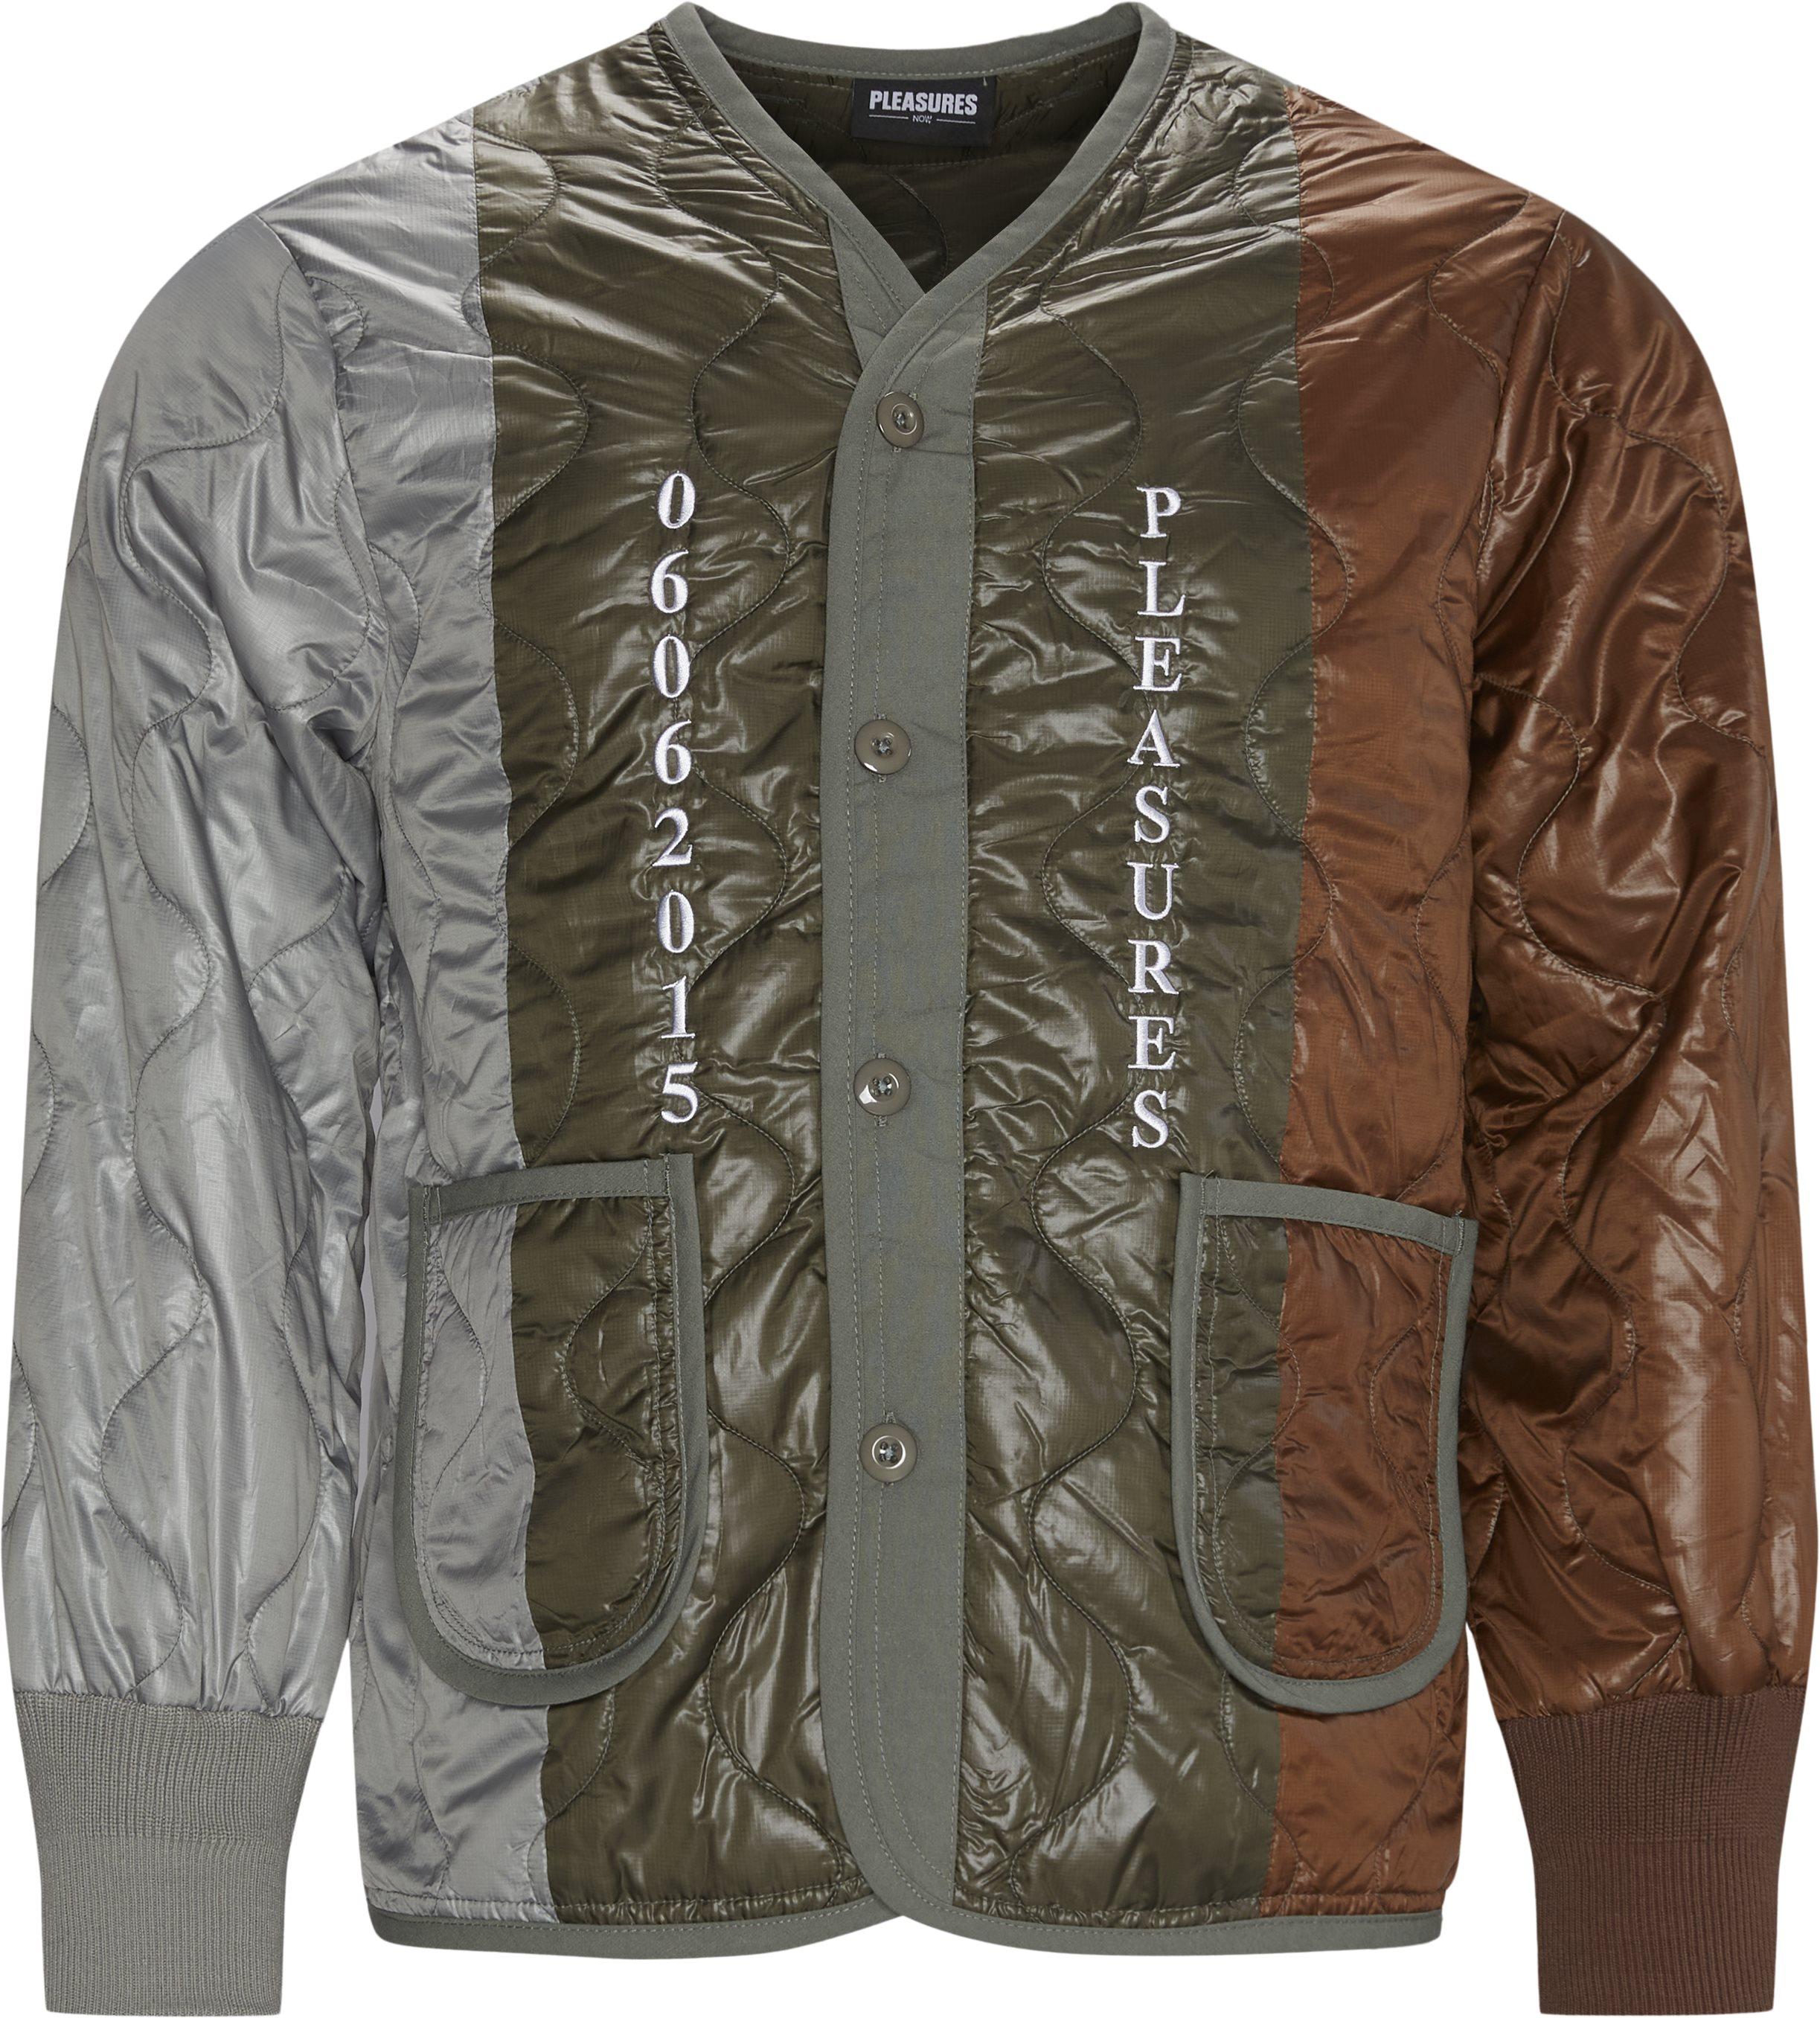 Misery Jacket - Jackor - Regular - Grön